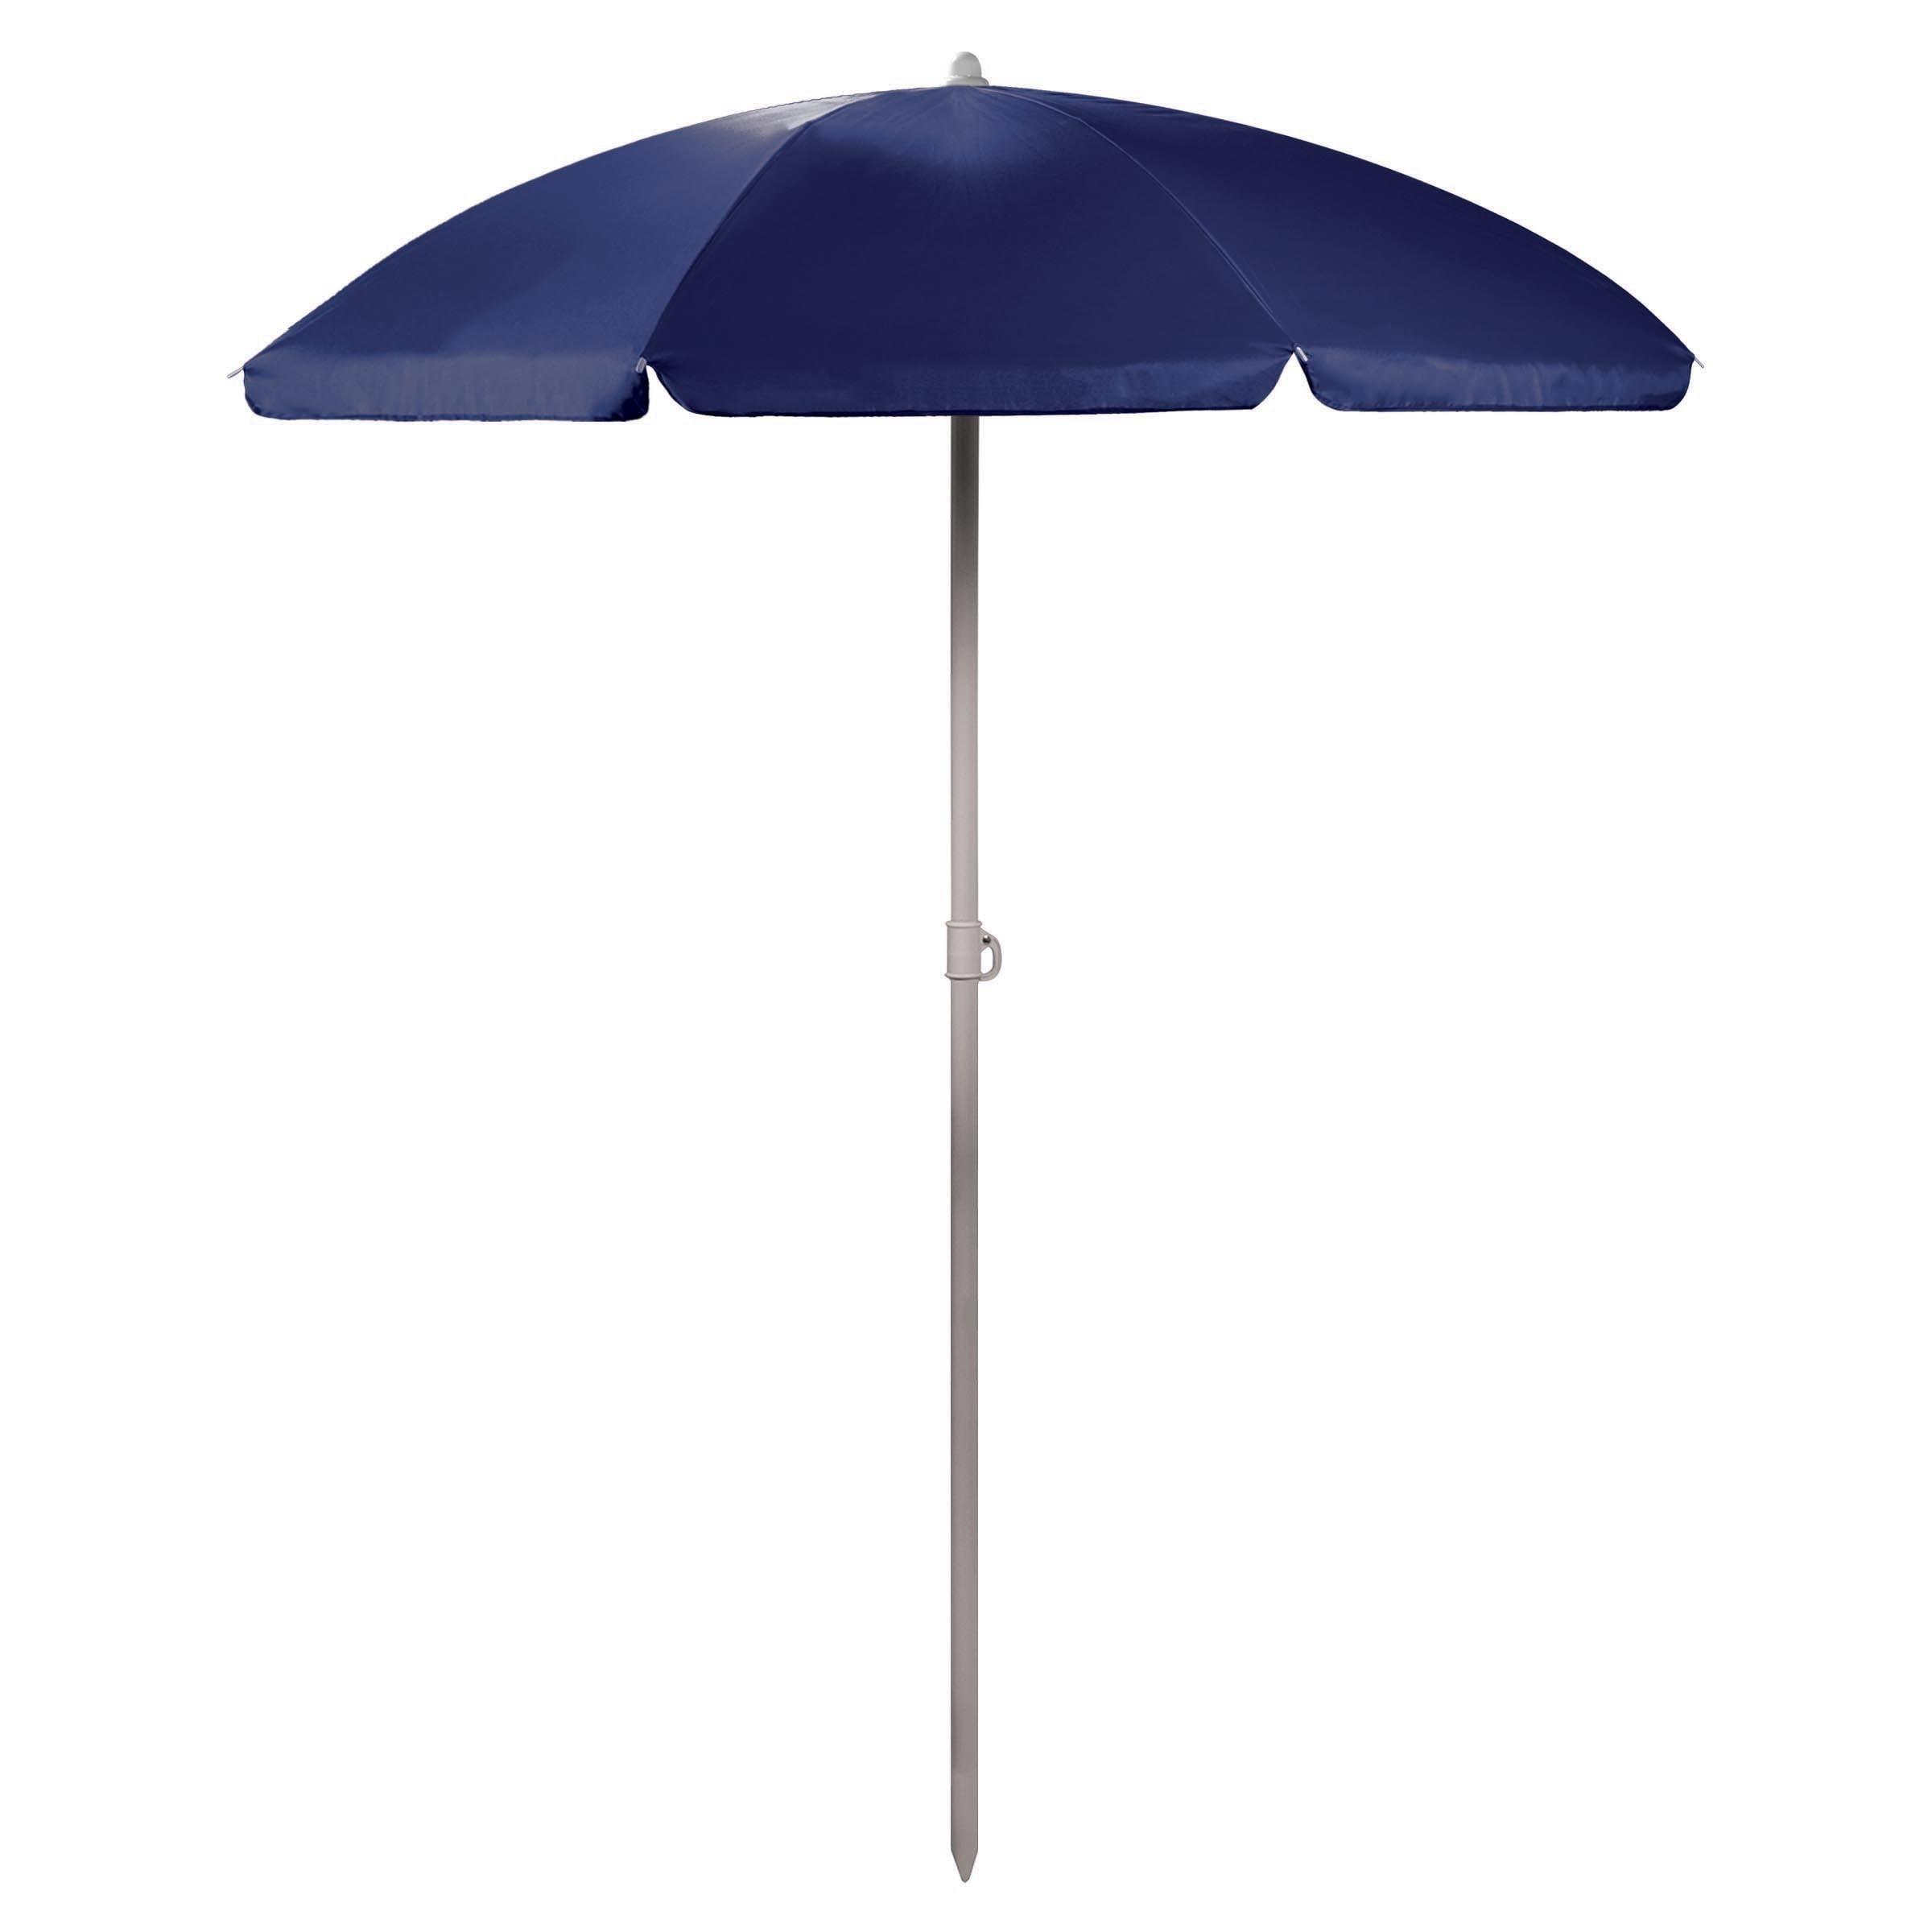 Oniva 5.5-foot Blue Portable Beach/Picnic Umbrella (Navy)...